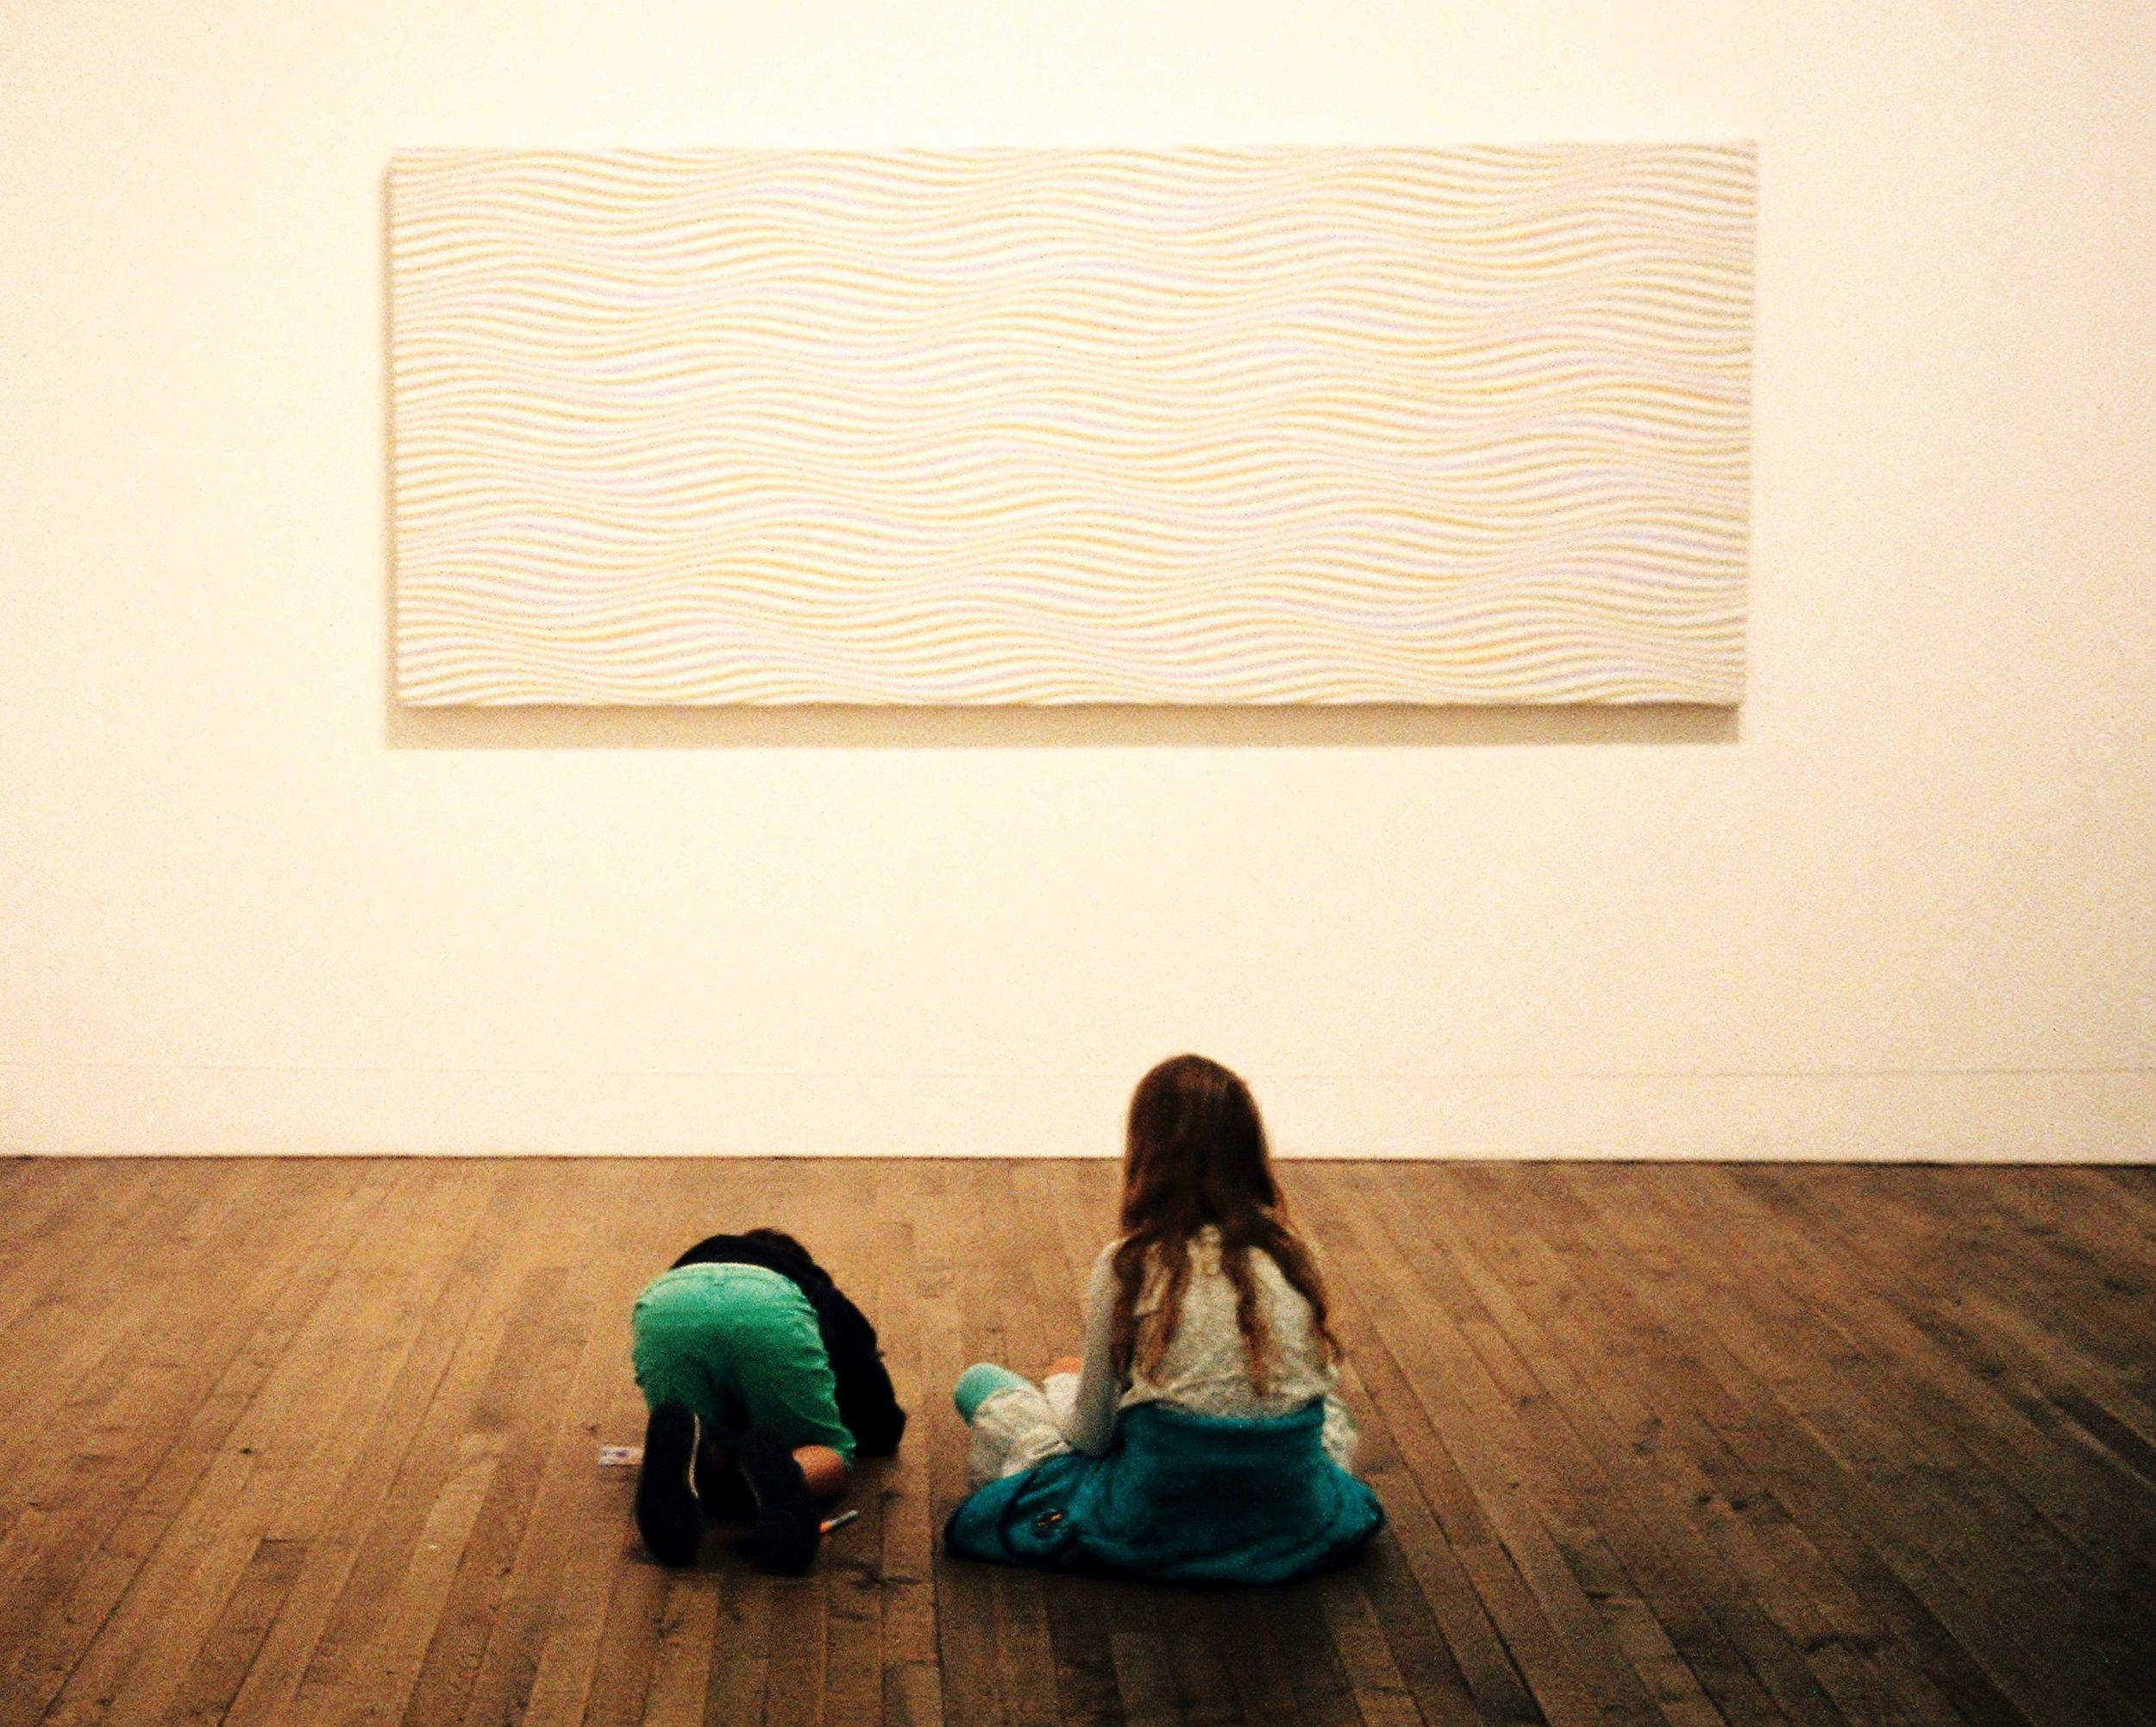 Lucy Wainwright | Art | Olympus XA2 | Superia200